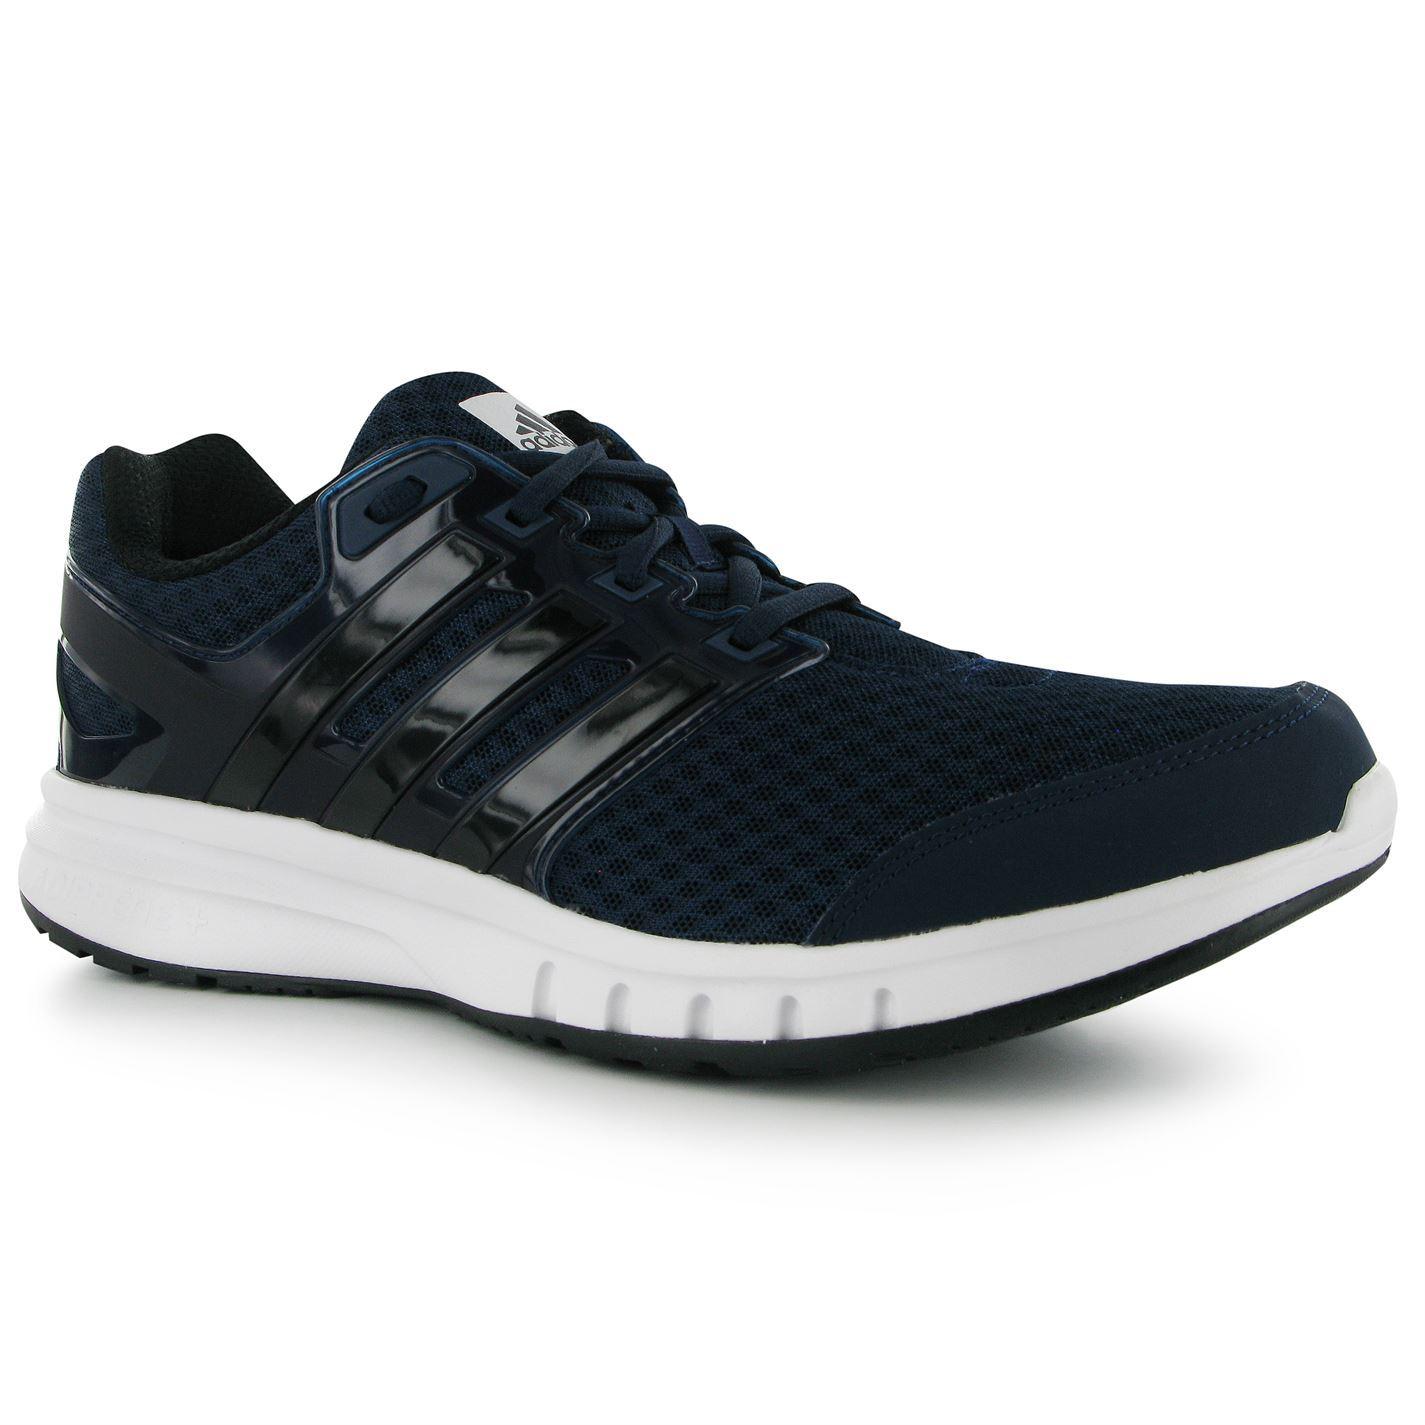 Adidas Mens Galaxy Elite Running Shoes Navy